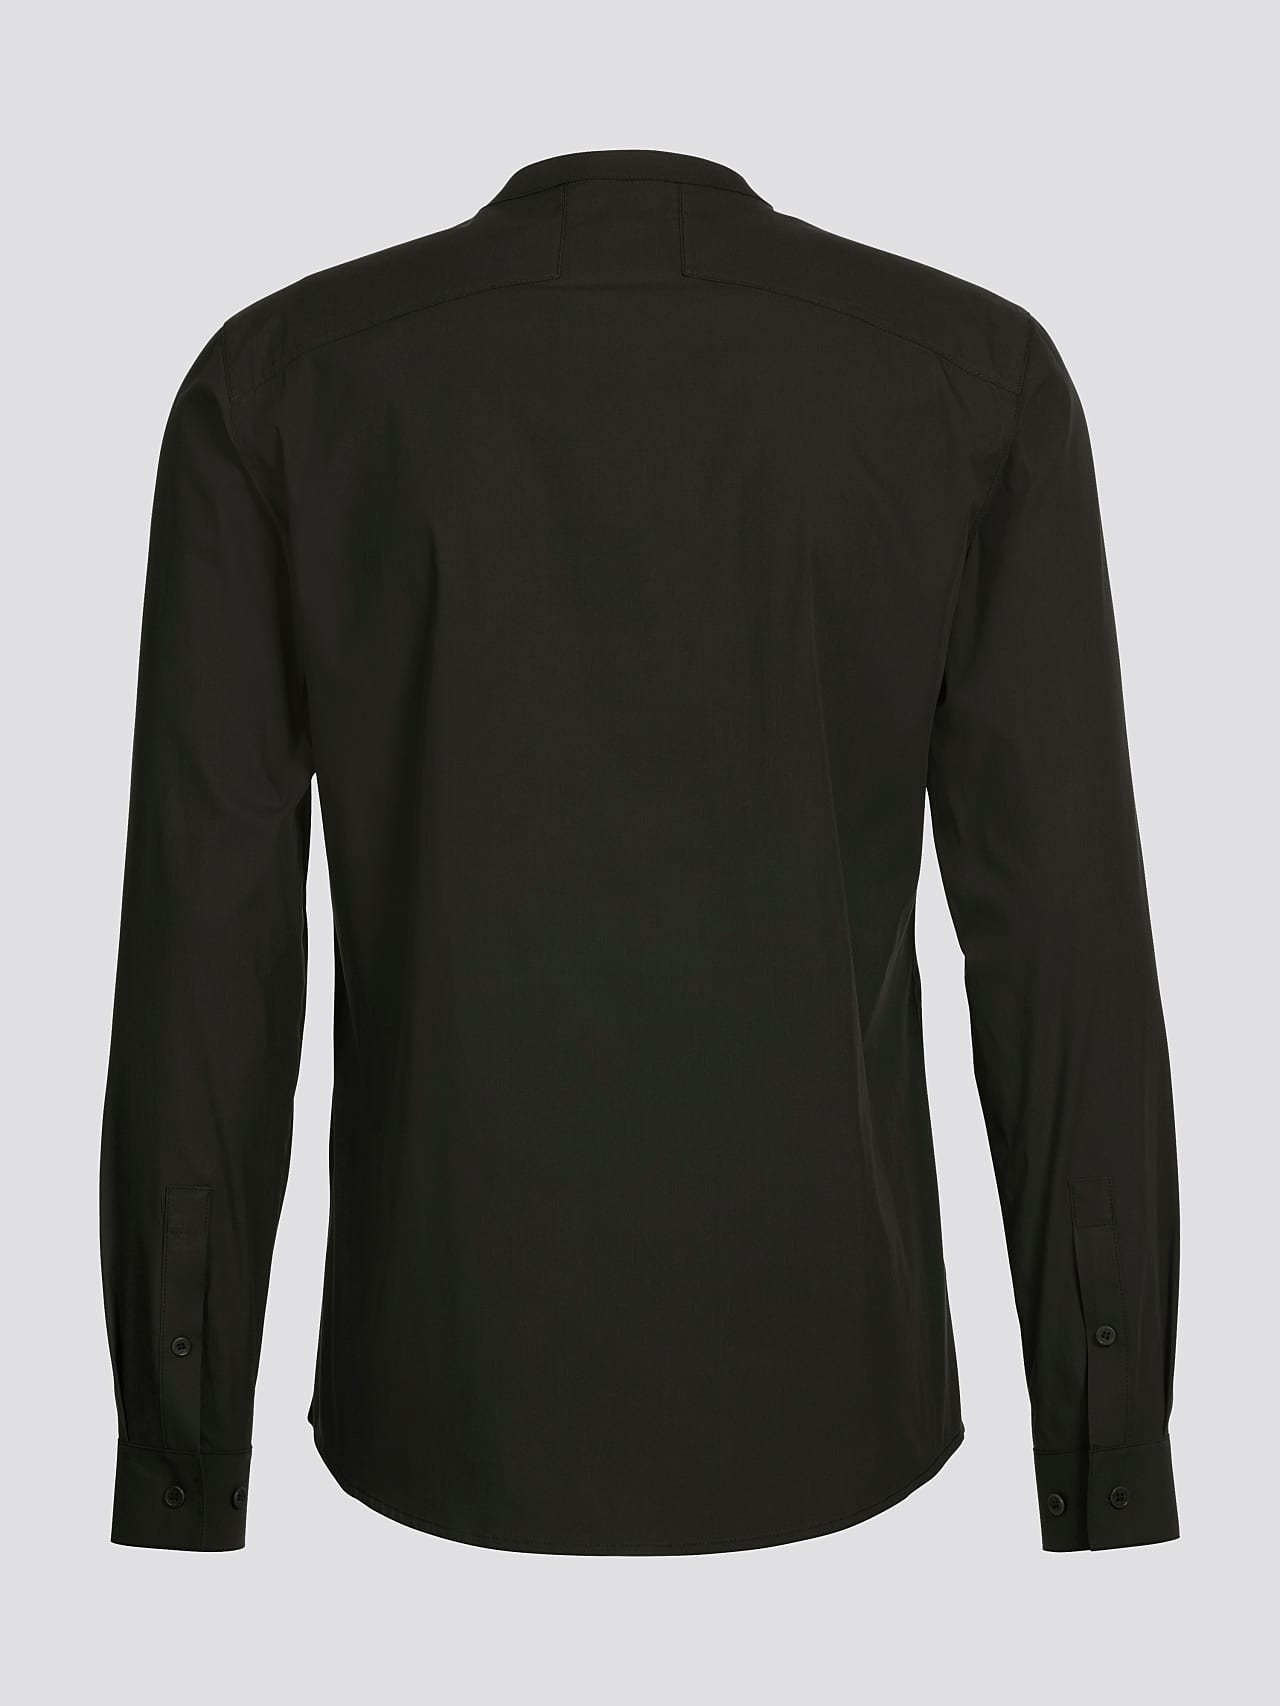 WIDT V9.Y5.01 Stand-Up Collar Cotton-Stretch Shirt olive Left Alpha Tauri